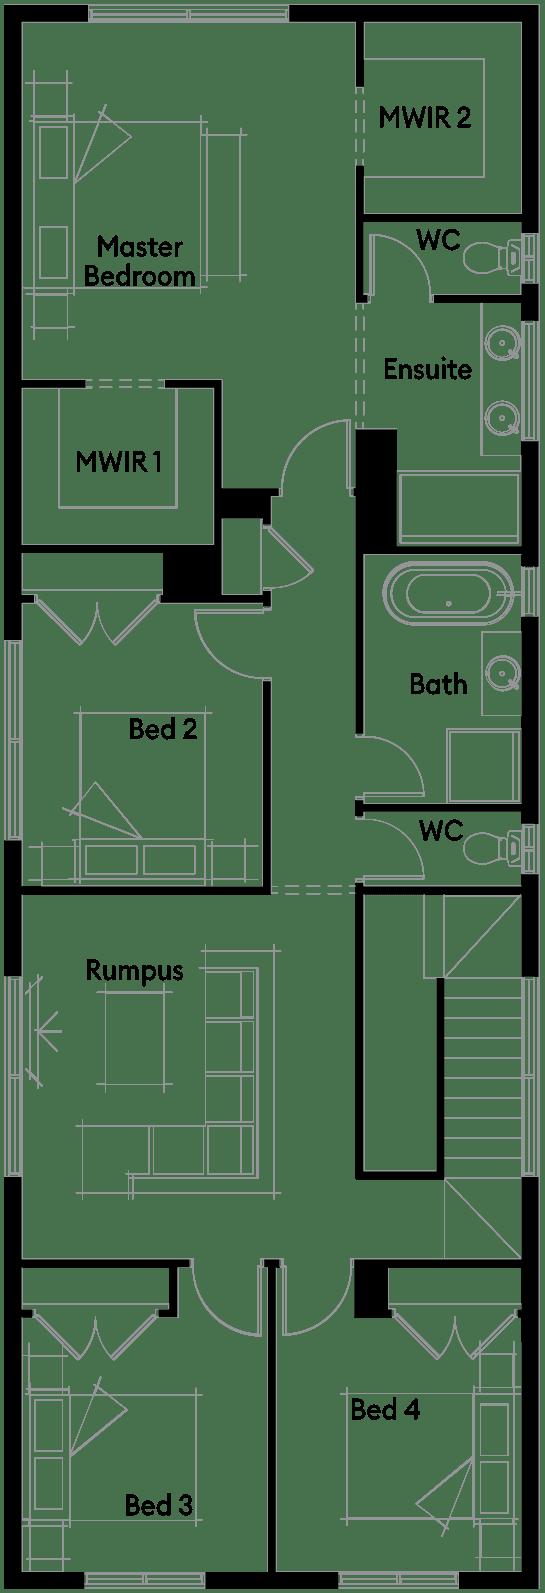 FloorPlan2_HOUSE852_Charlton_28MK2-02